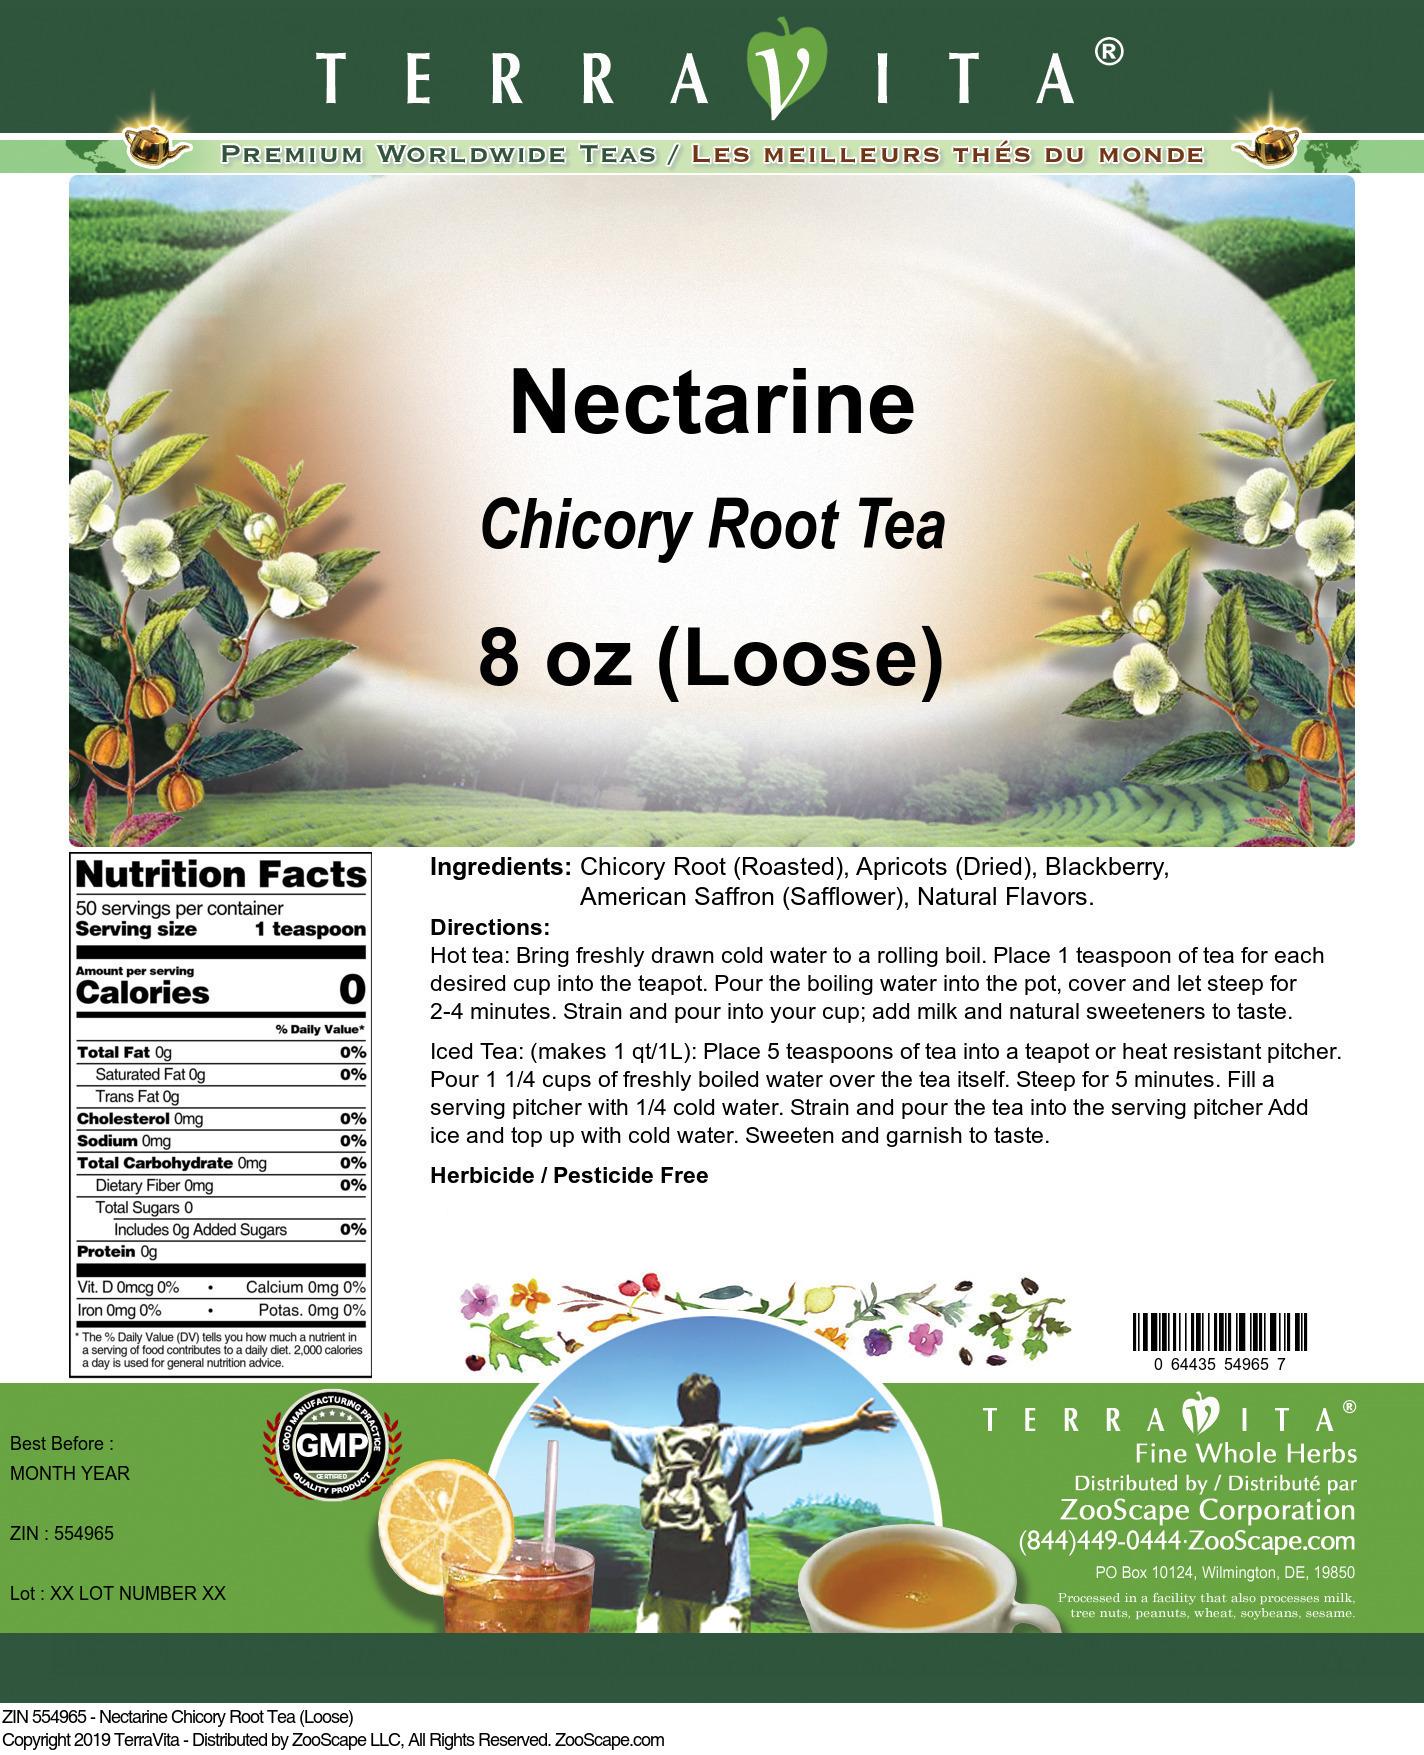 Nectarine Chicory Root Tea (Loose)